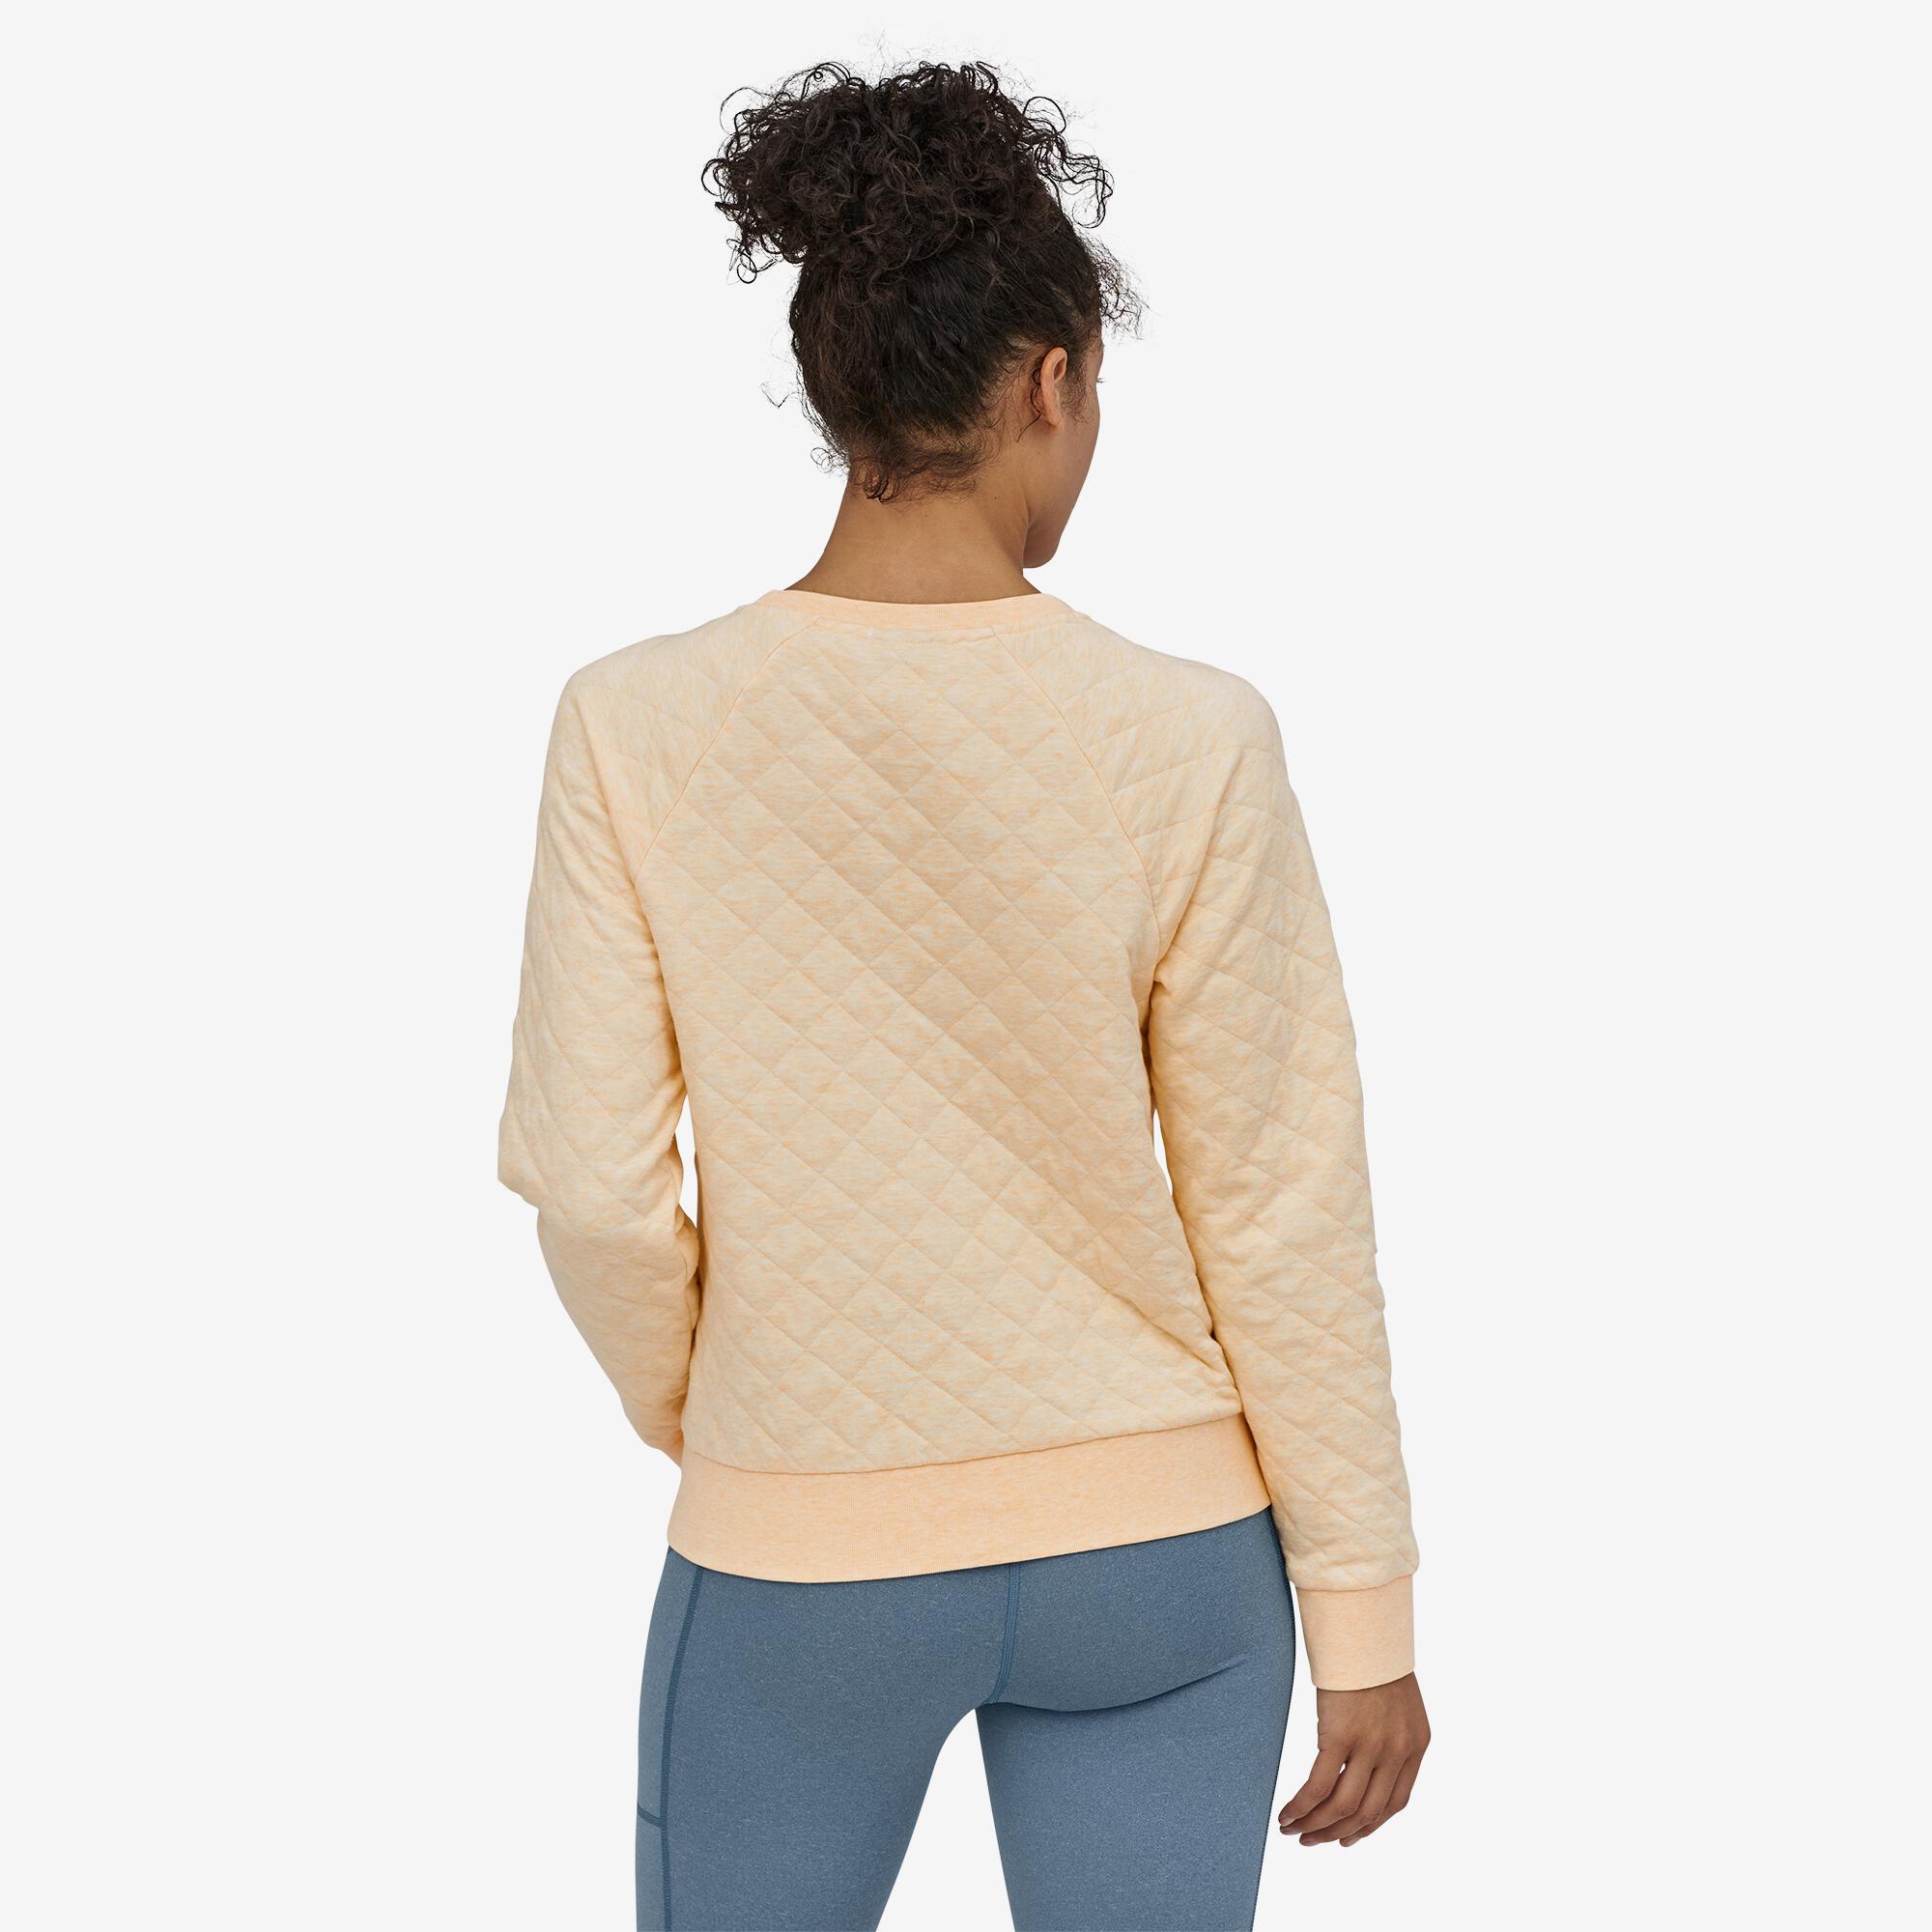 Patagonia Women S Organic Cotton Quilt Crew Sweatshirt